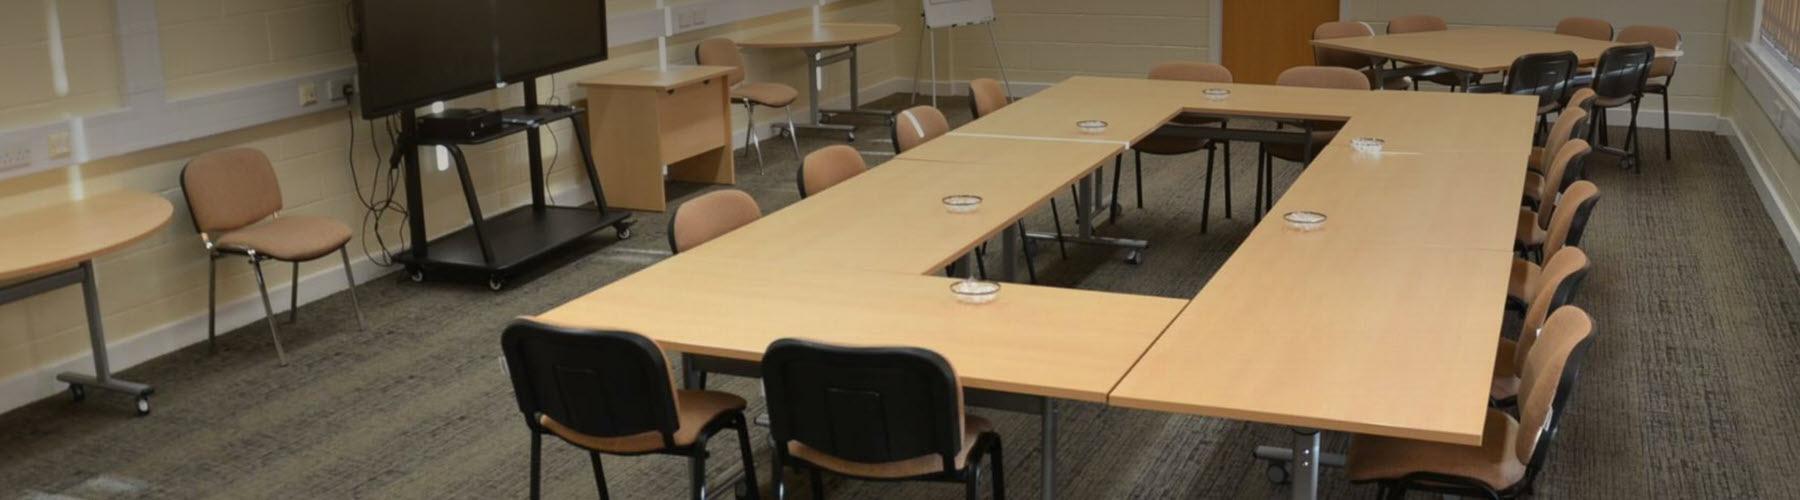 meeting room hire lancashire